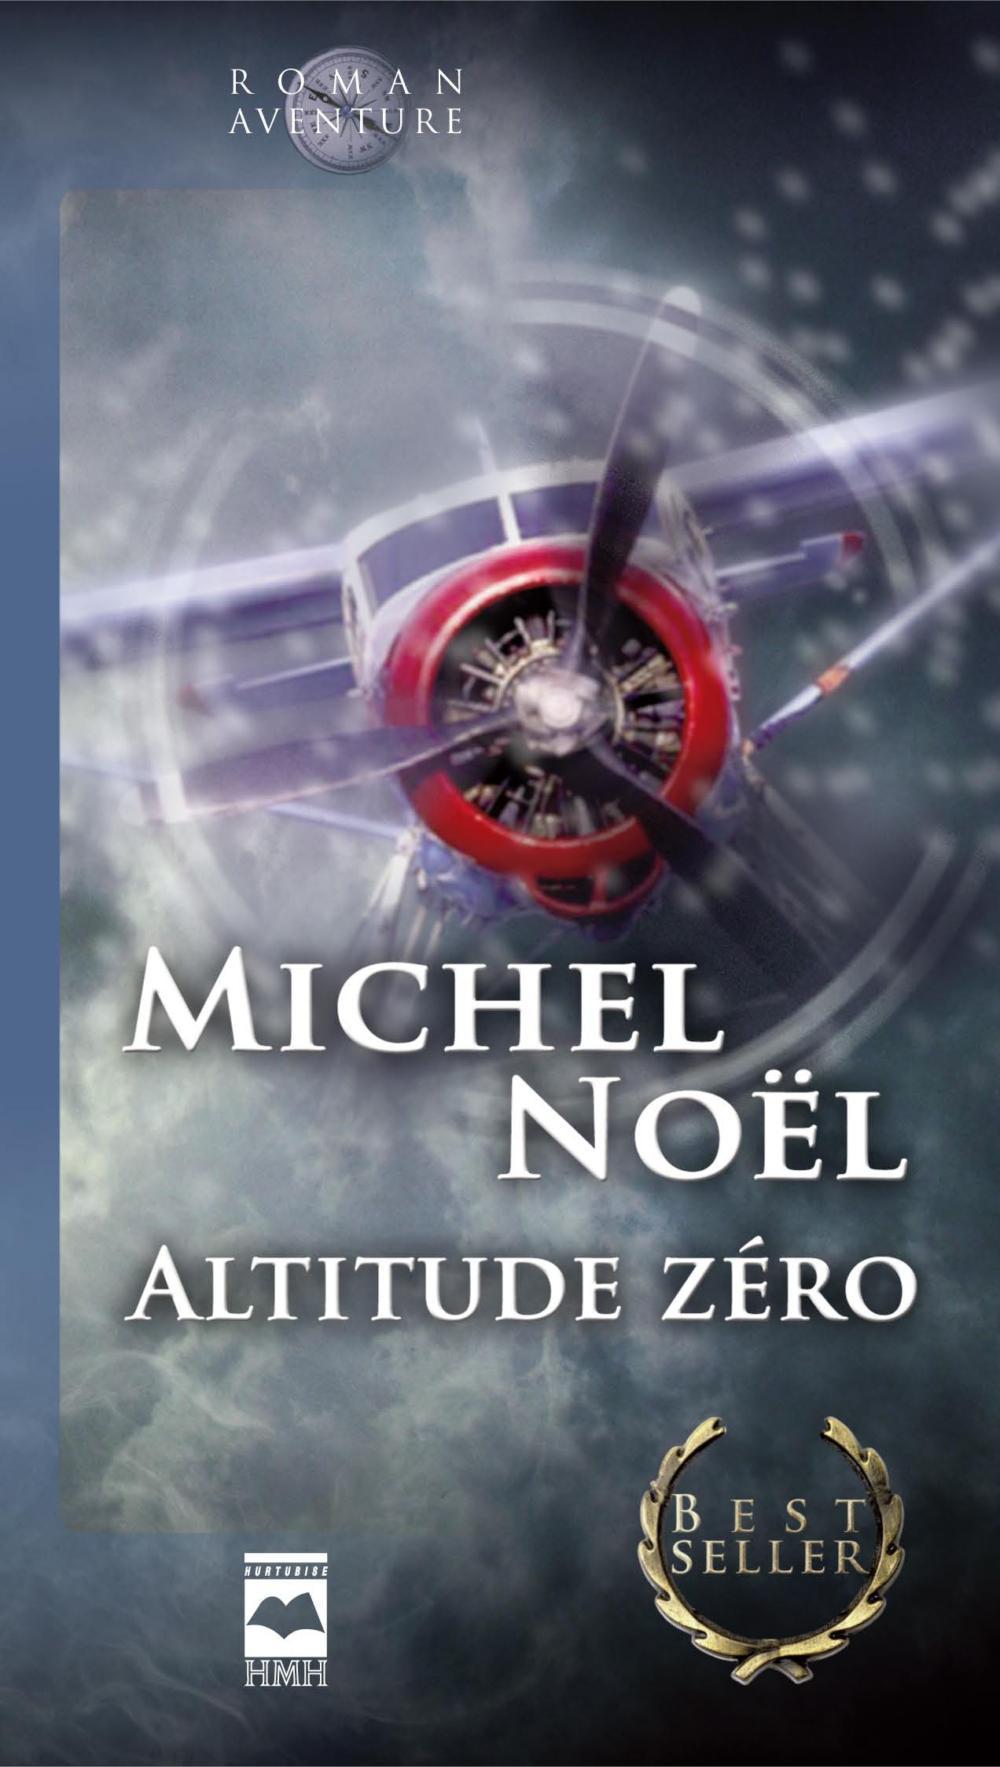 Altitude zéro